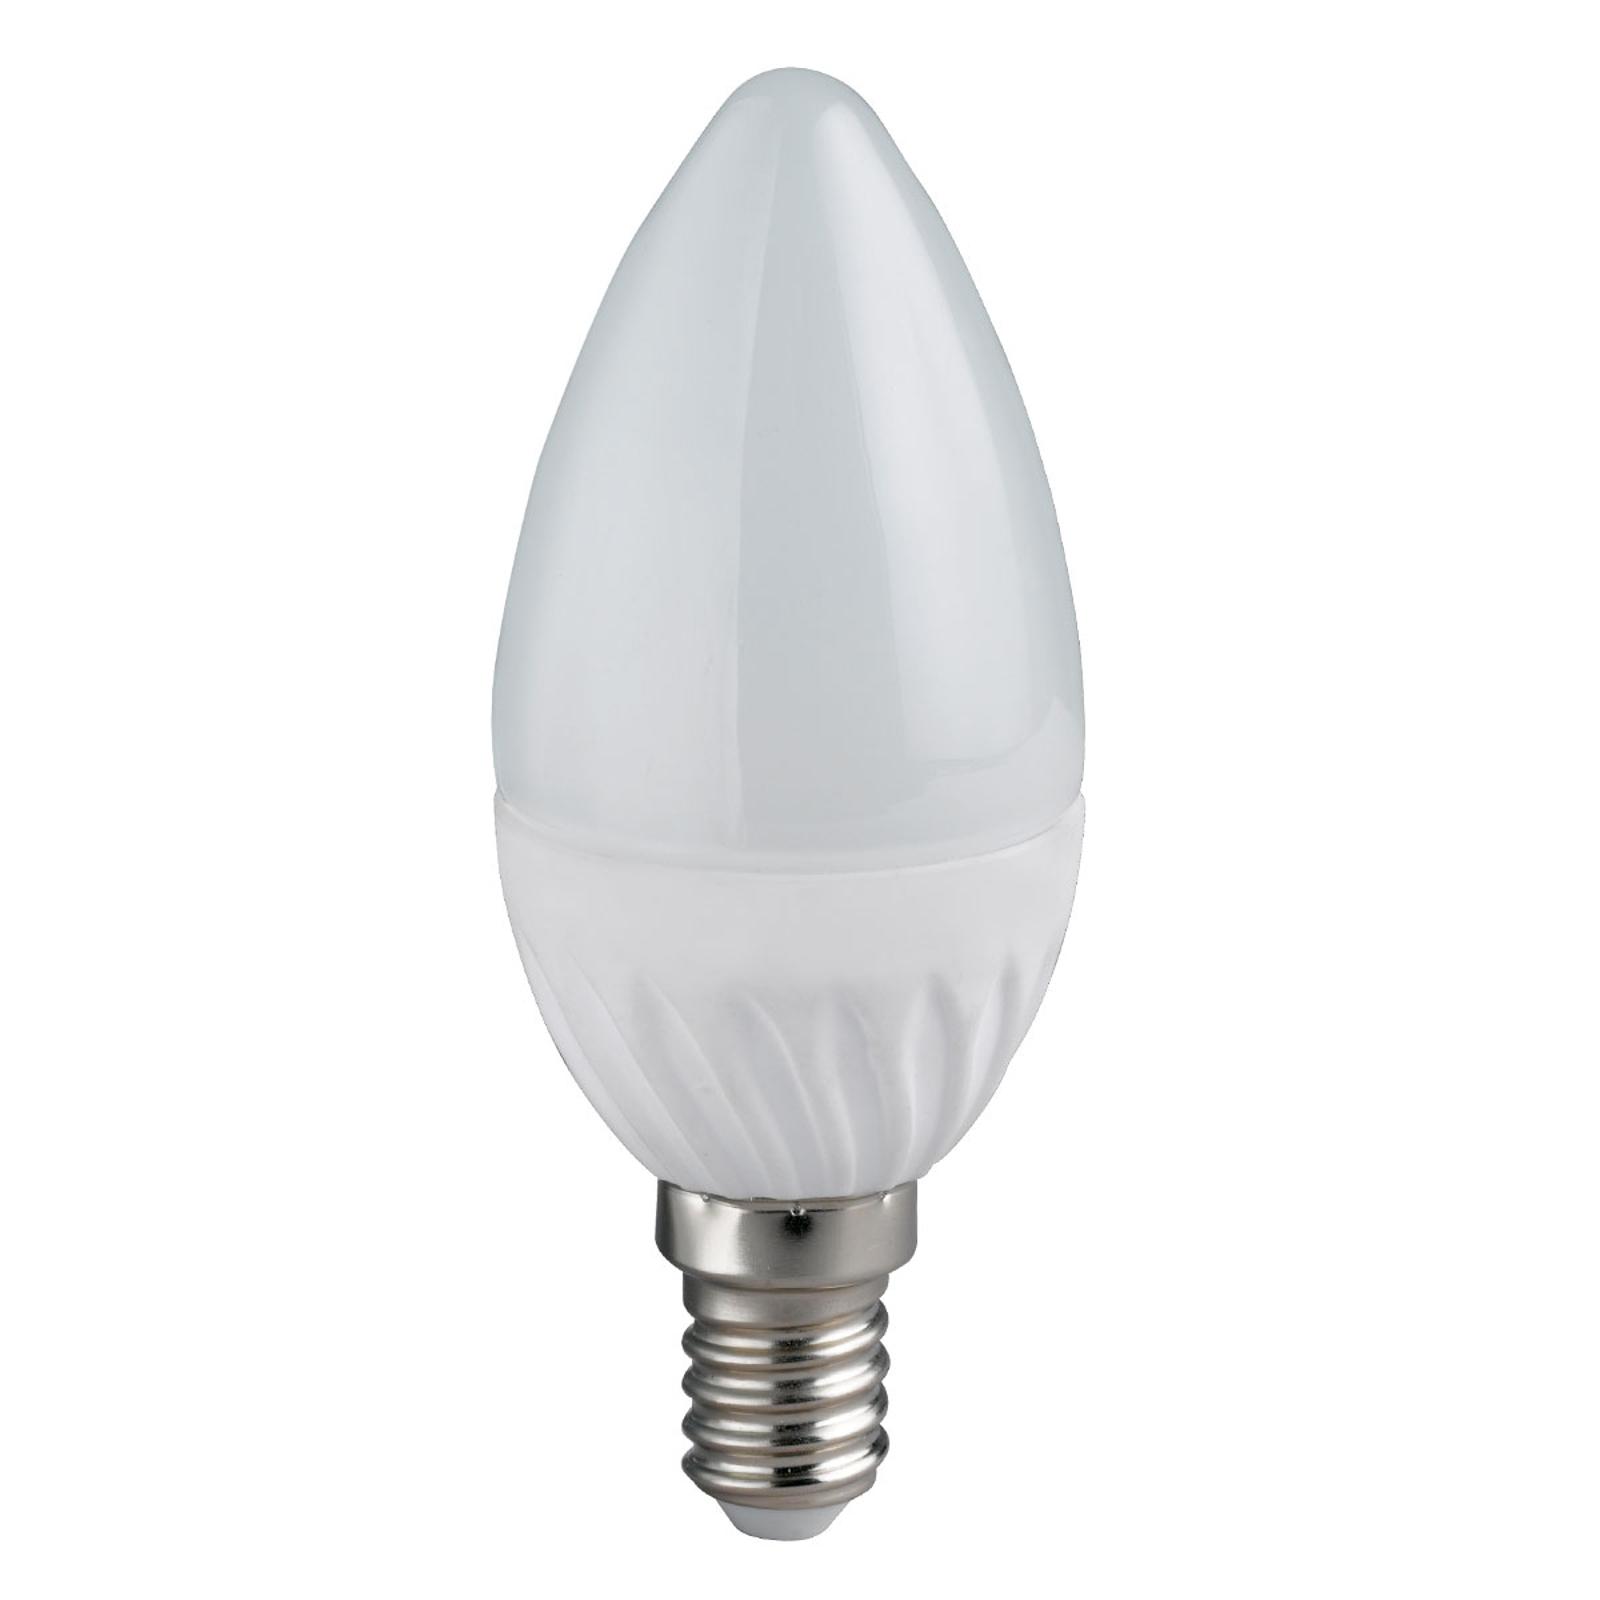 LED-Kerzenlampe E14 5W, dimmbar, warmweiß